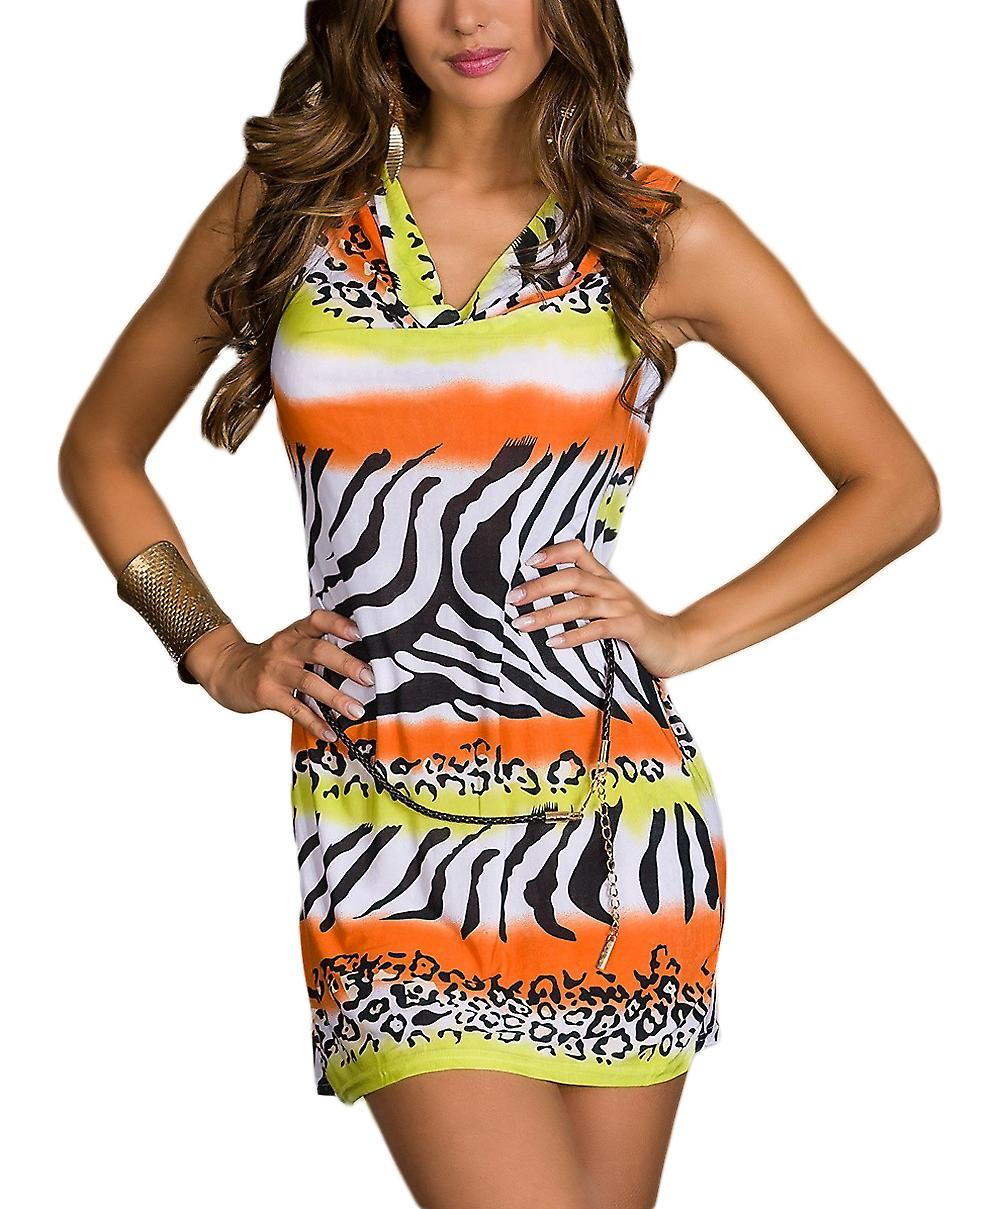 Waooh - Zebra Print Dress Totam